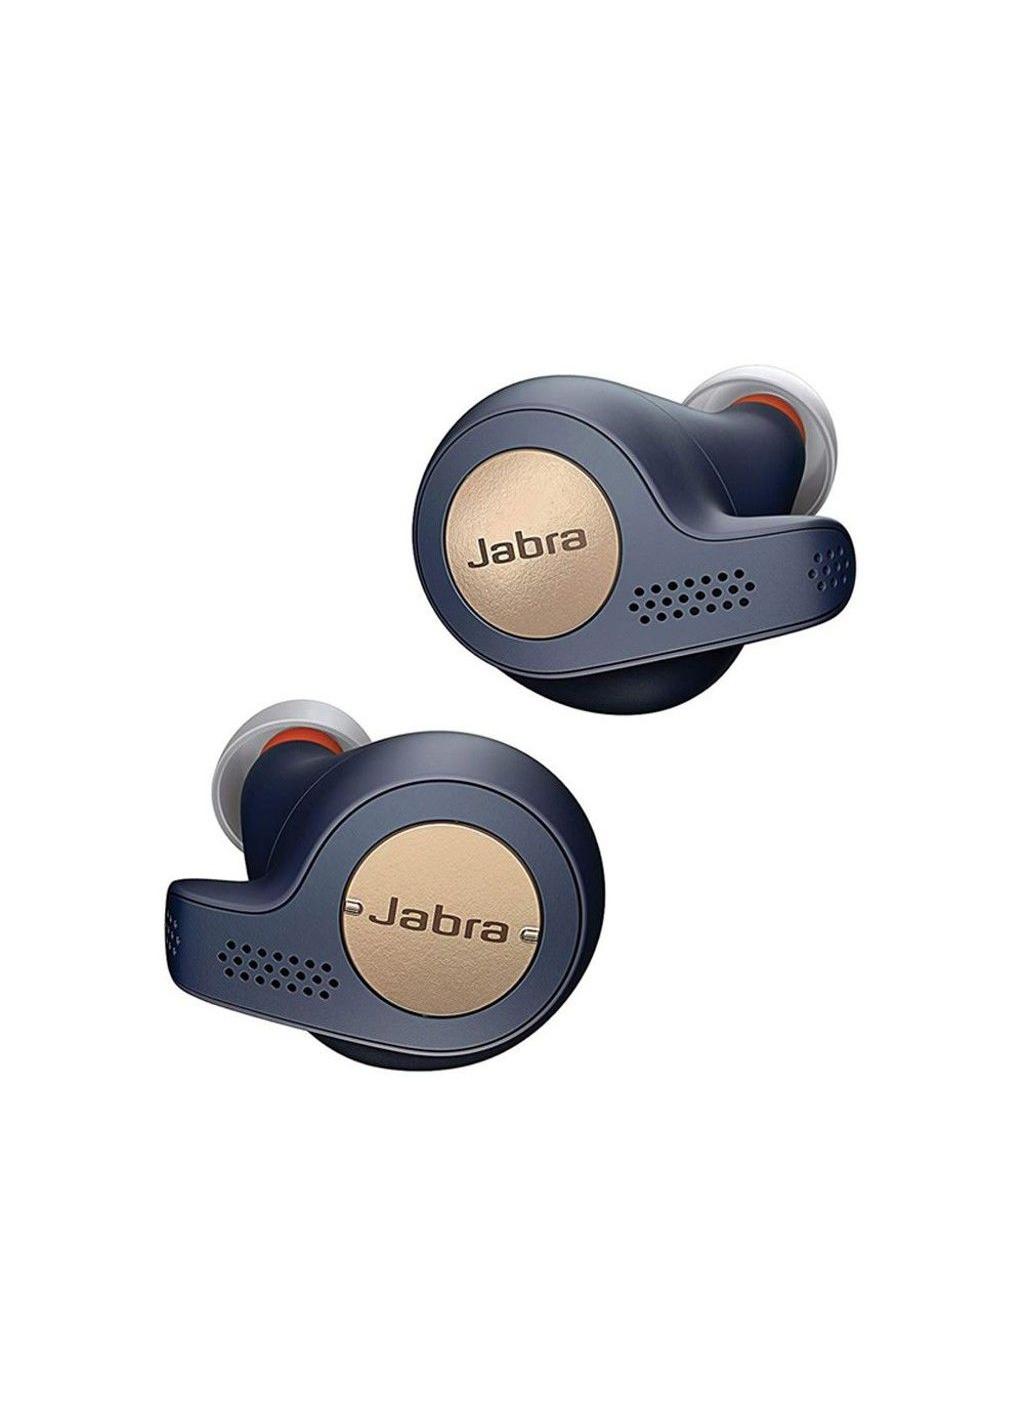 Standart Jabra Elite Active 65t Cooper Siyah Wireless Bluetooth Kulak İçi Kulaklık